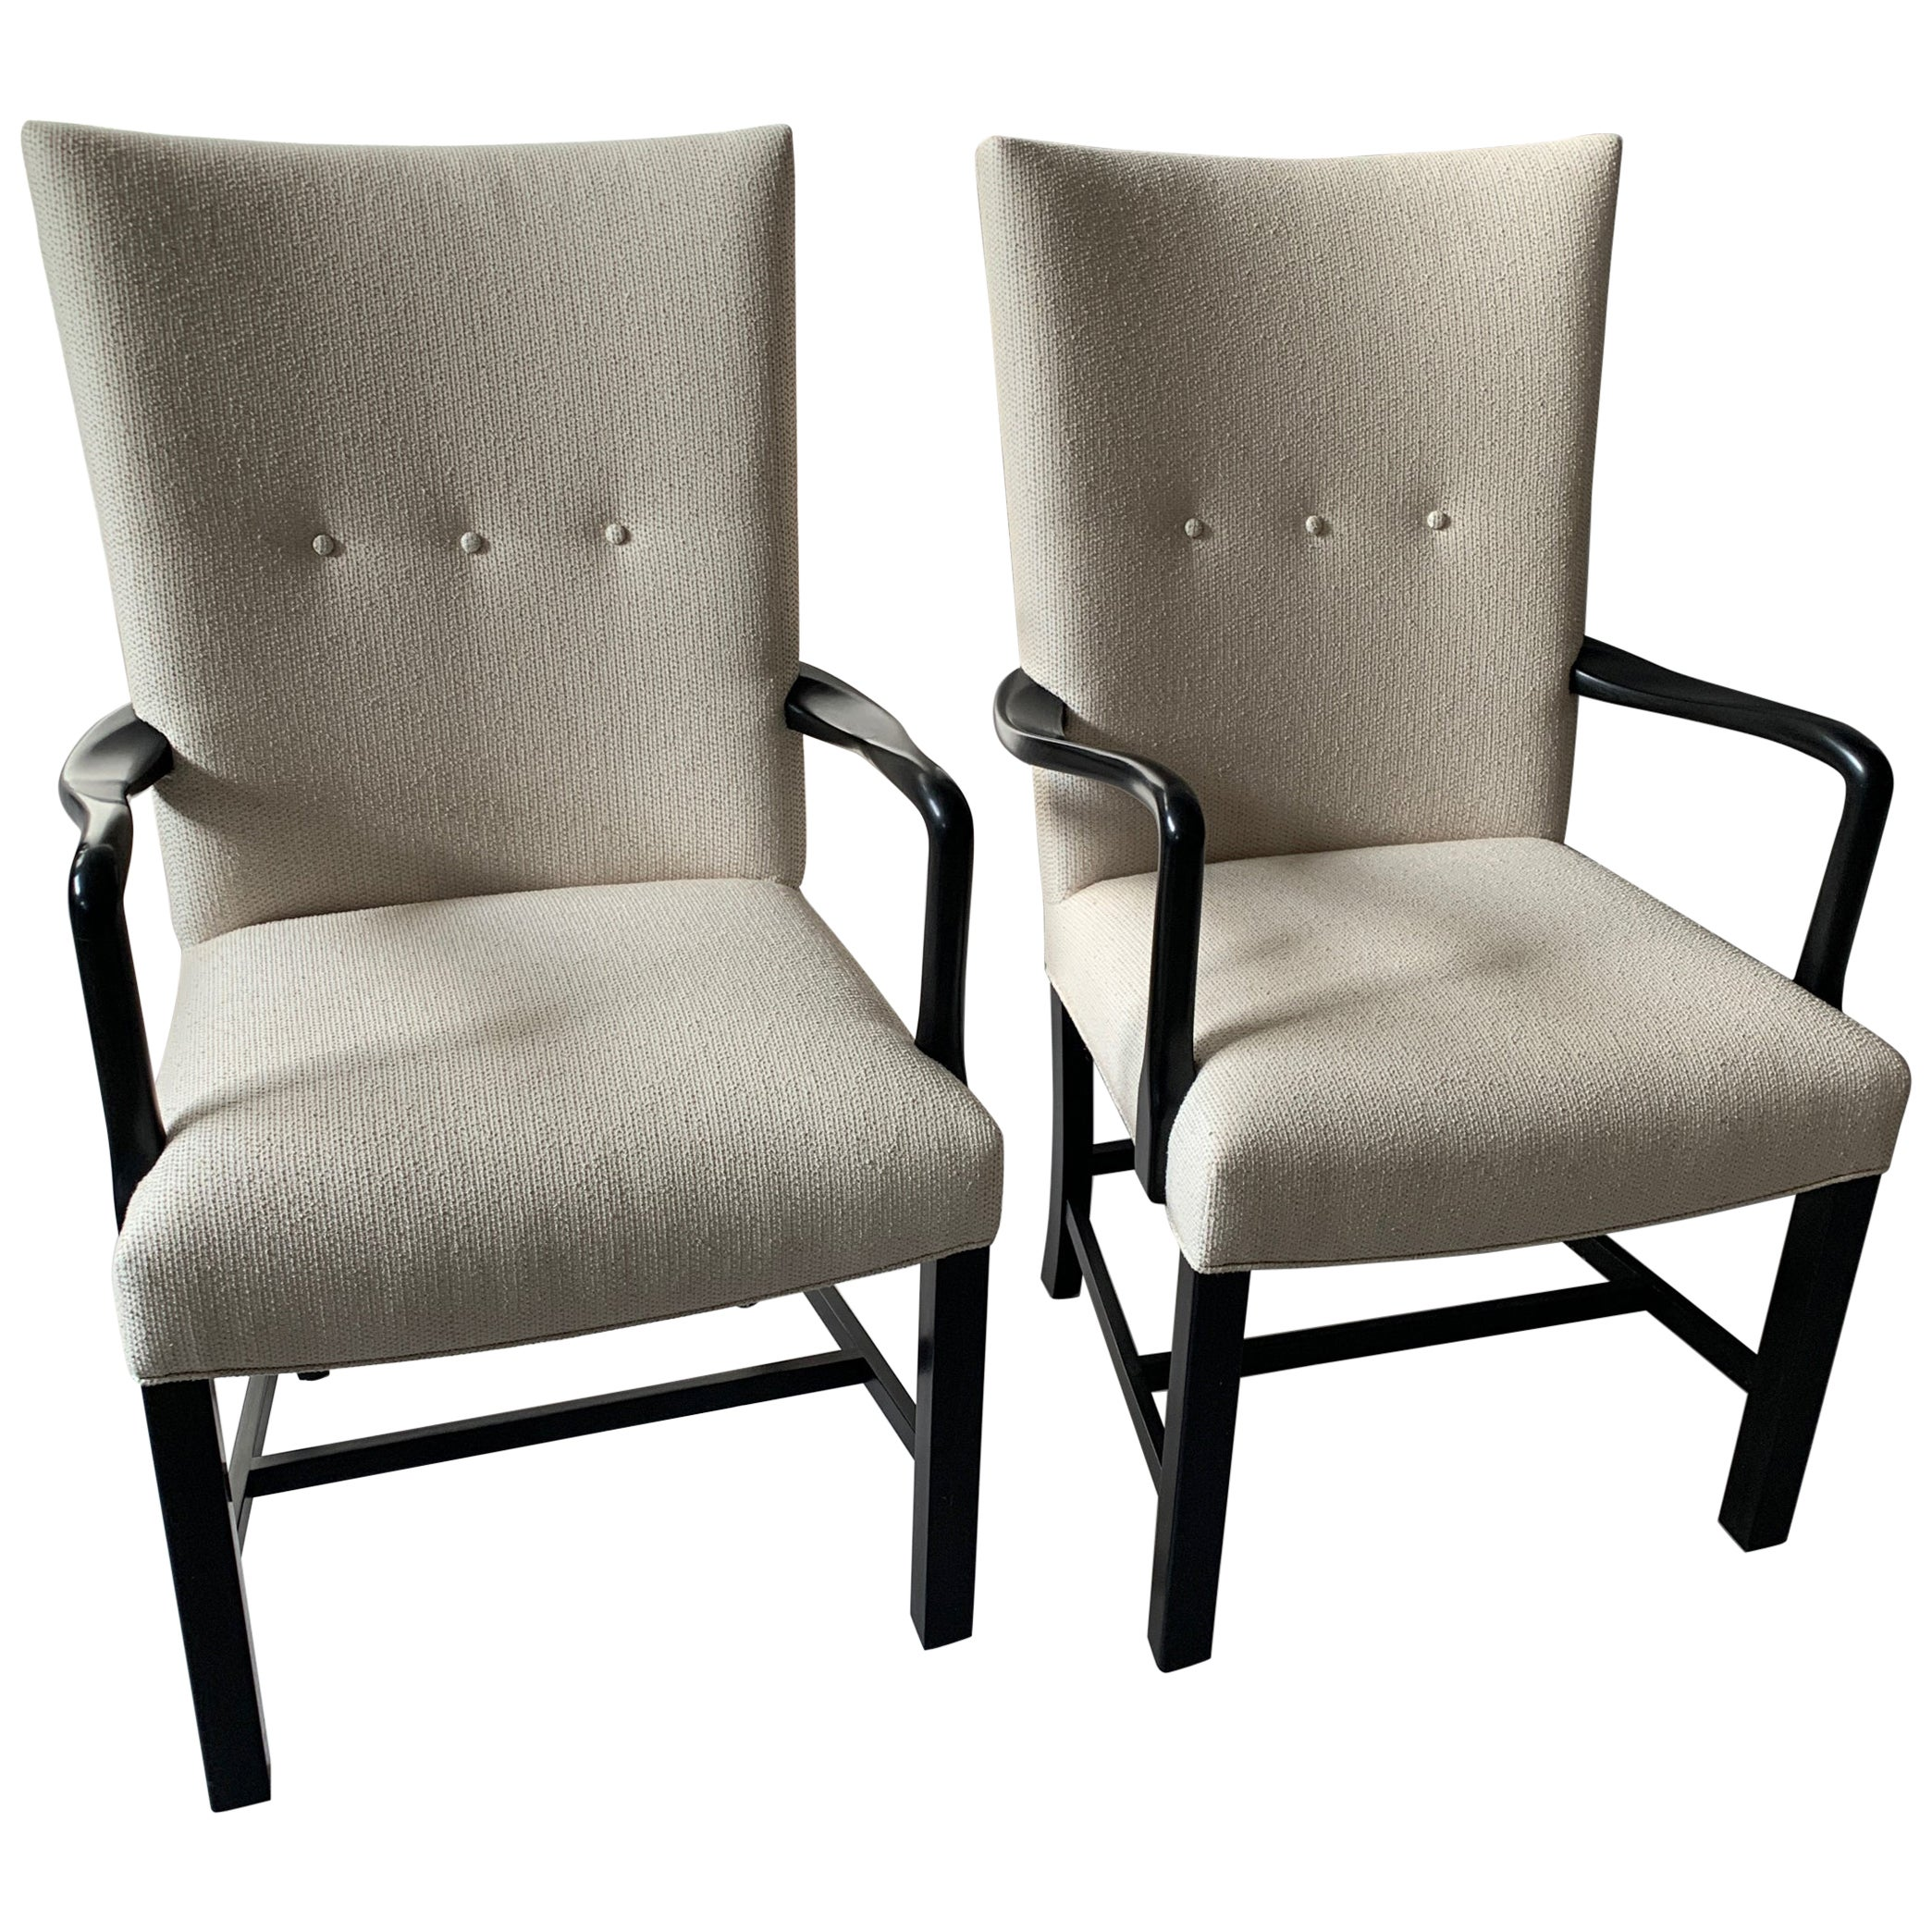 Pair of Newly Upholstered Midcentury Danish Ebonized Armchairs